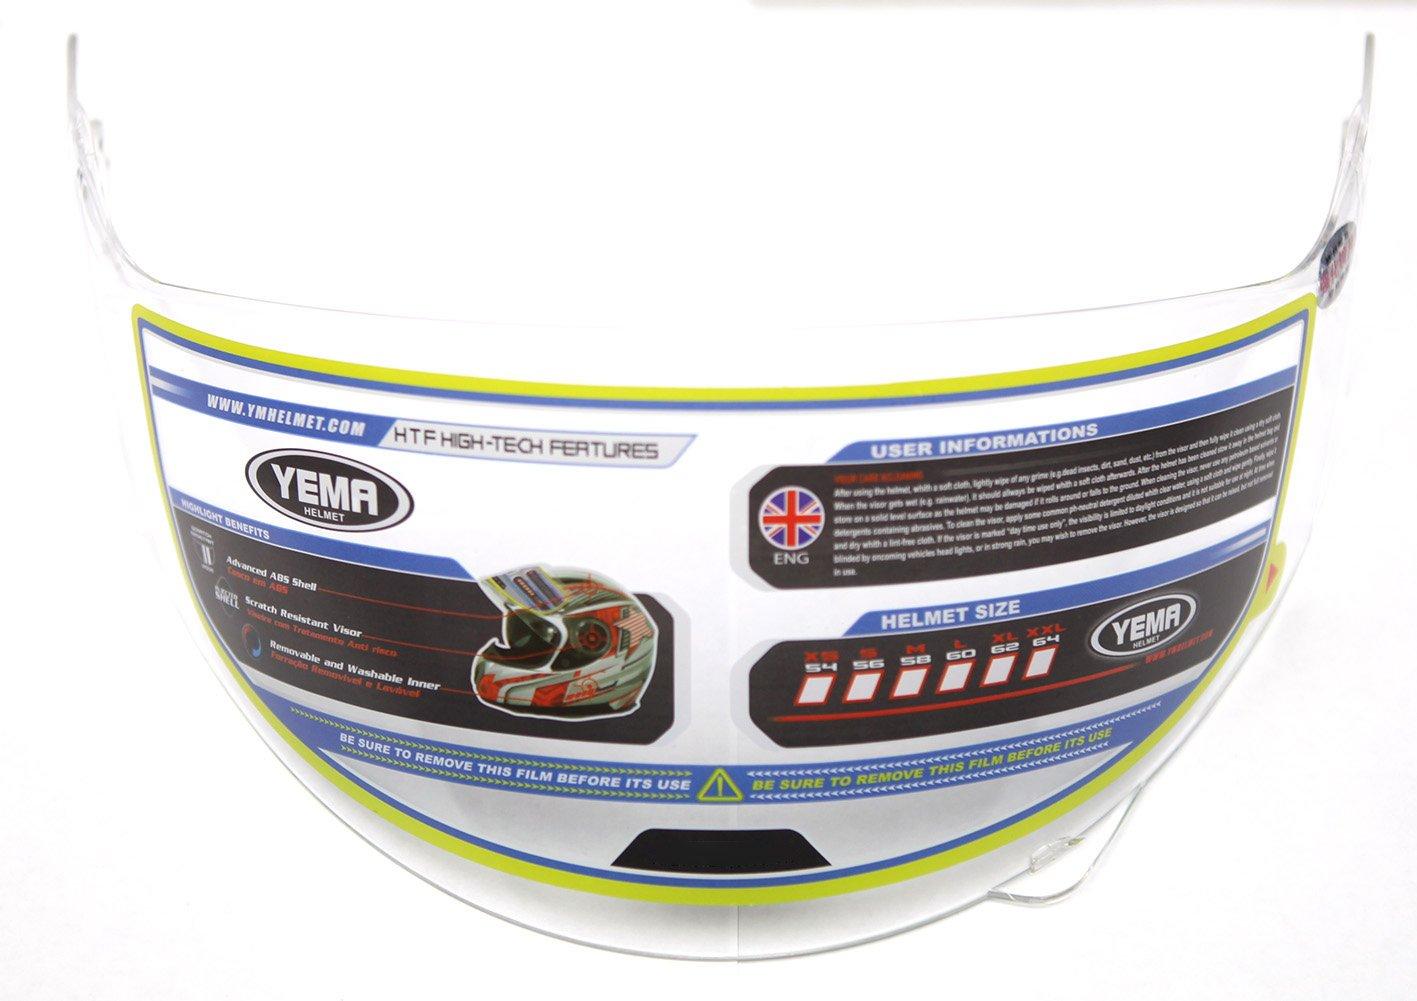 YEMA Casco Modulare Moto Integrale Scooter YM-925 Caschi Modulari Motorino Integrali ECE Omologato Donna Uomo con Doppia Visiera Parasole, Nero opaco, S Lanxi Yema Motorcycle Fittings Co. LTD YM-925MBM